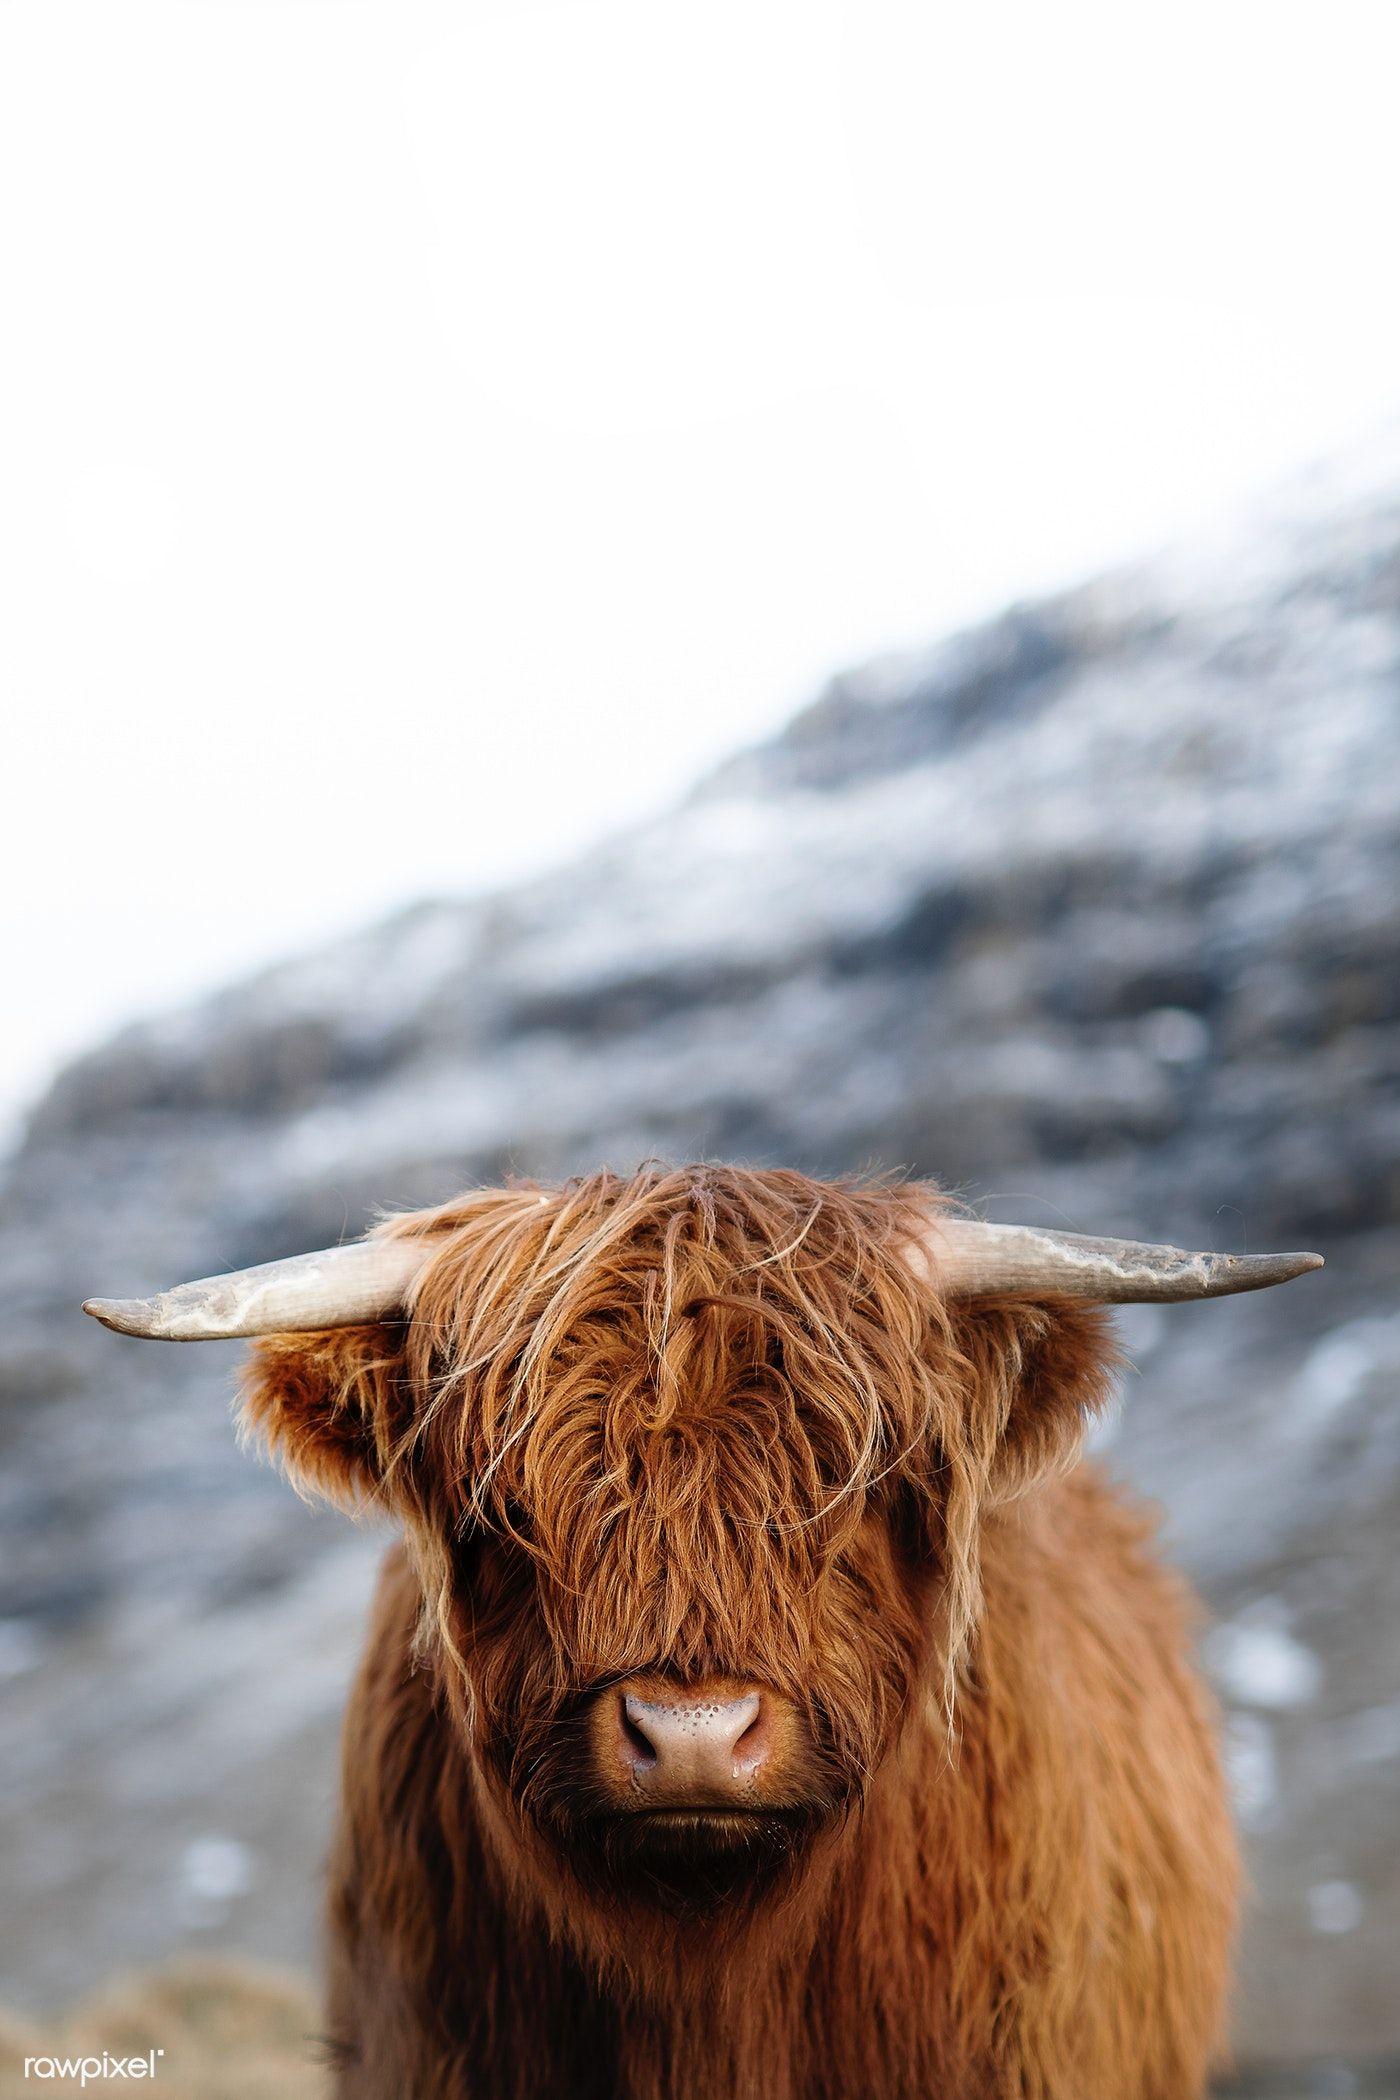 Download Premium Image Of Scottish Highland Calf In The Field 2208650 Highland Calf Scottish Highland Calf Scottish Highland Cow